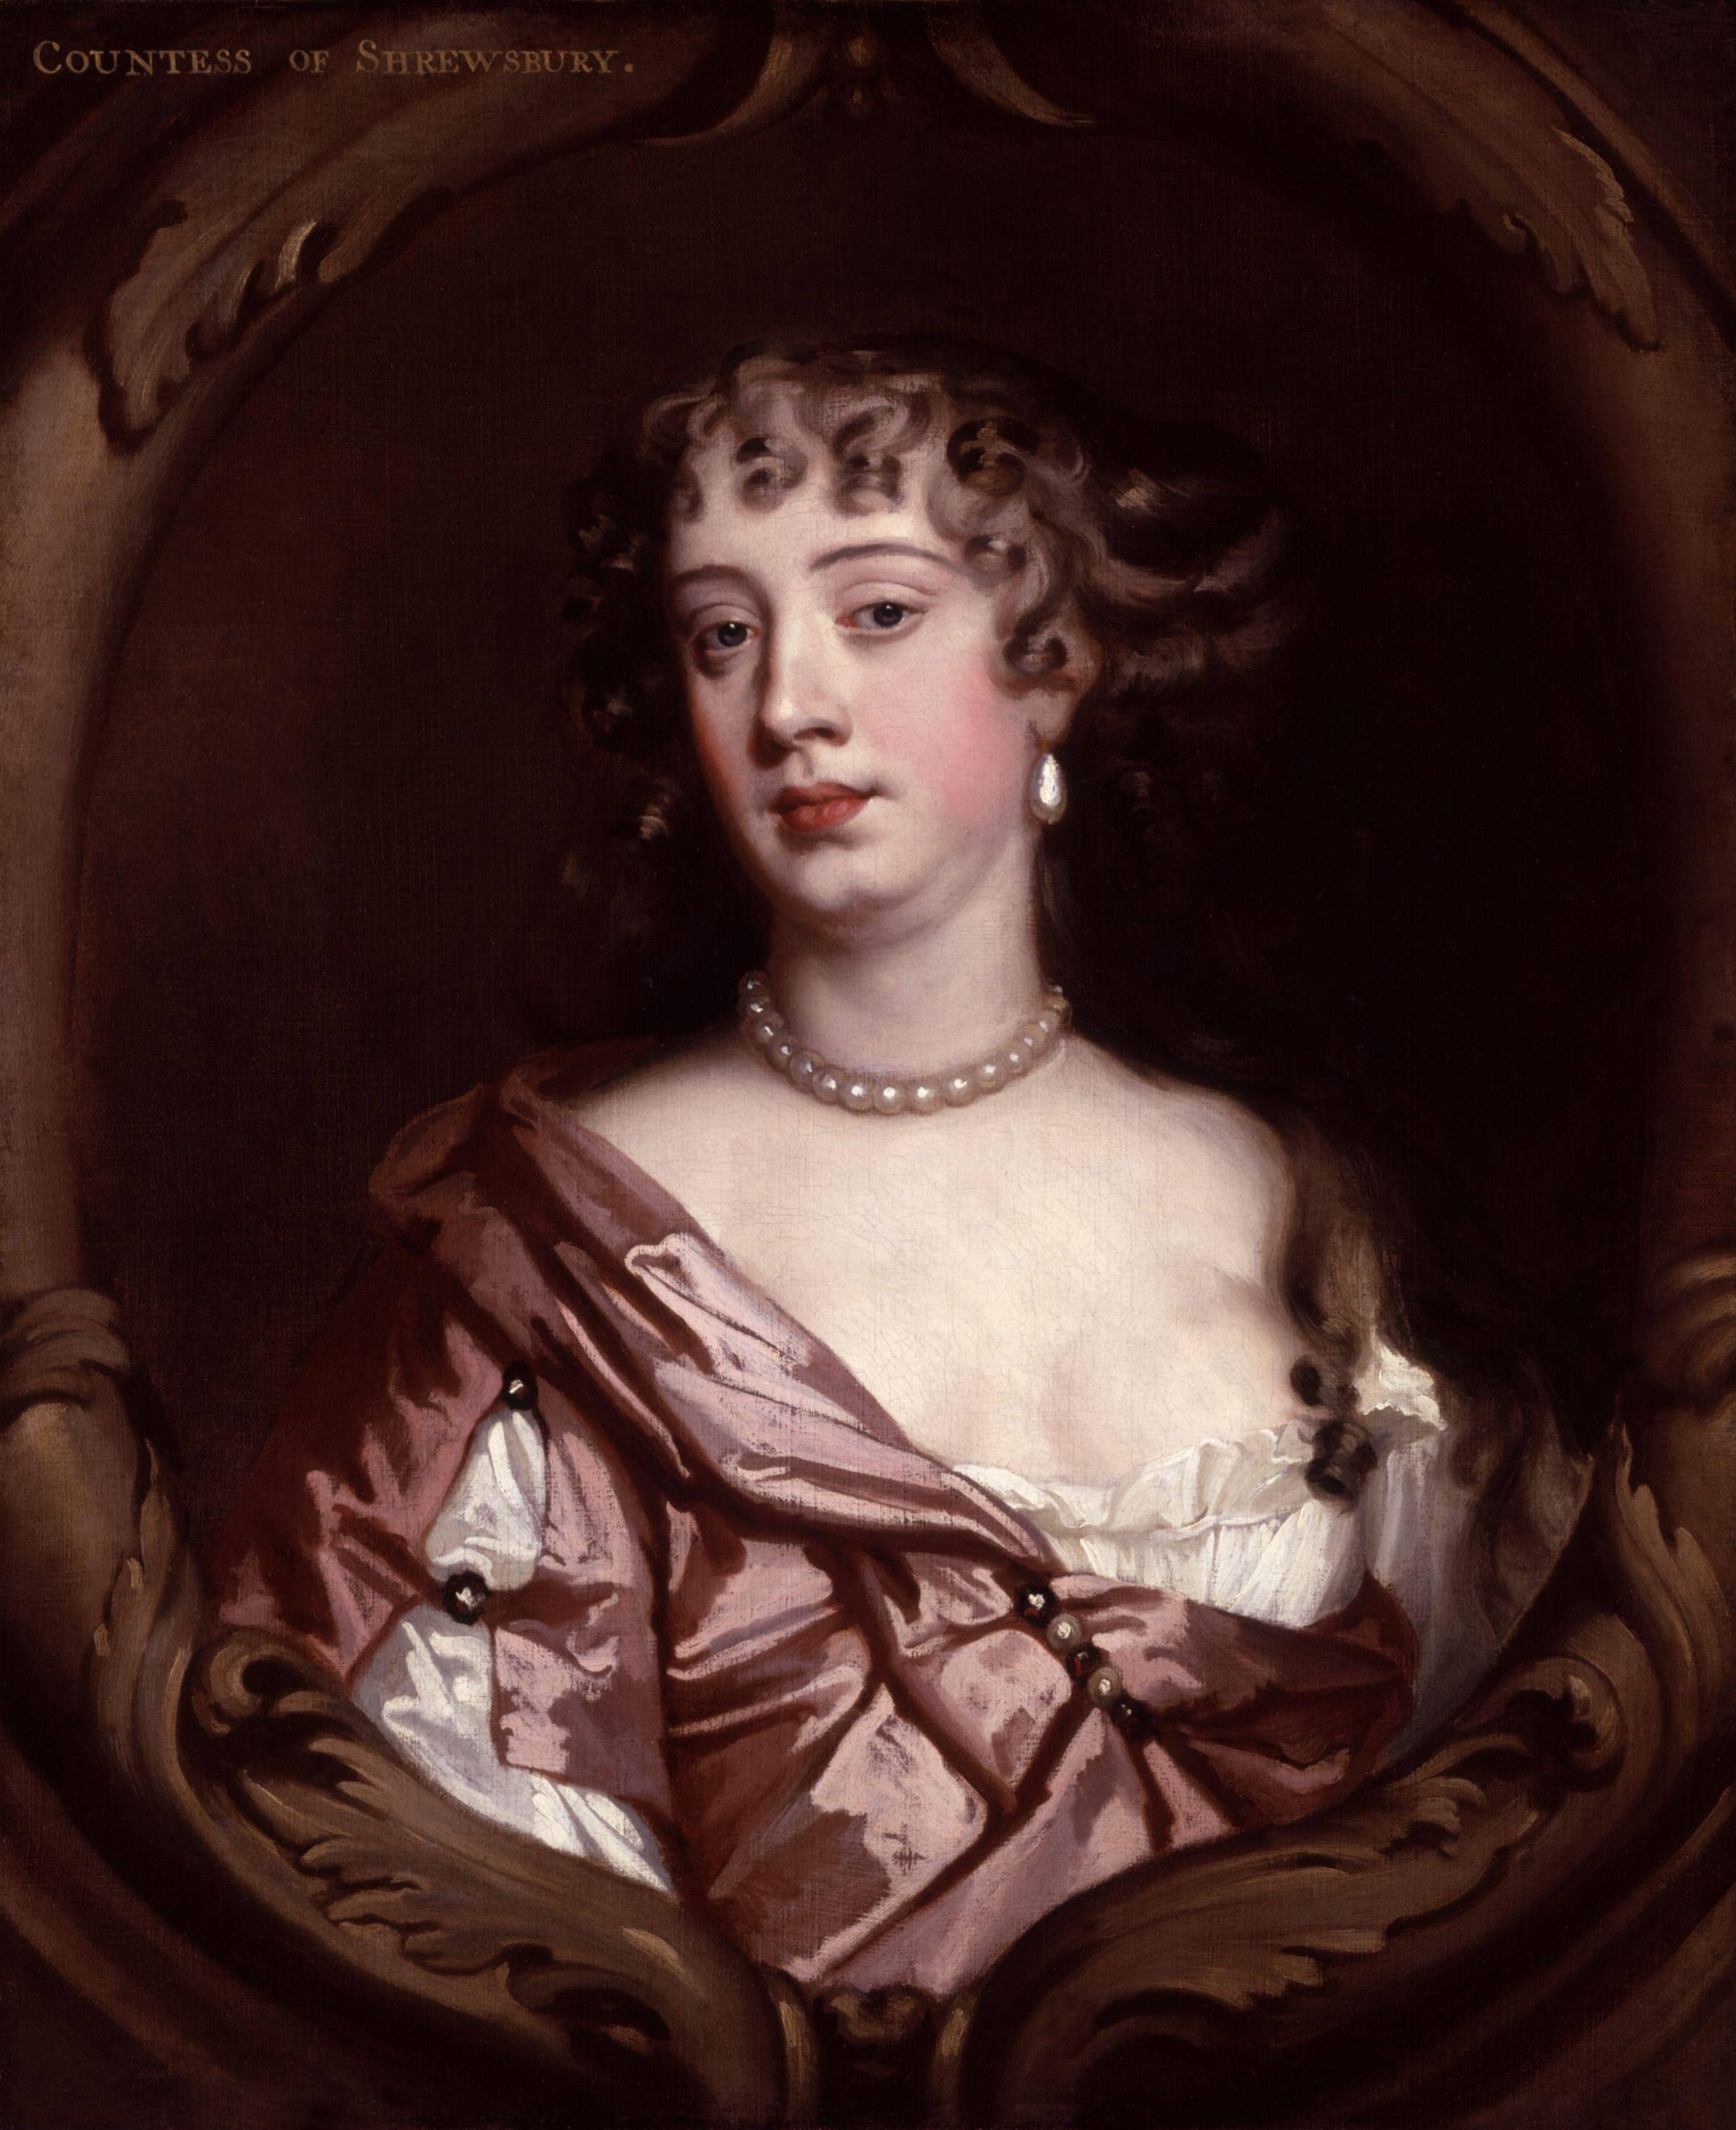 Anna Maria countess of shrewsbury